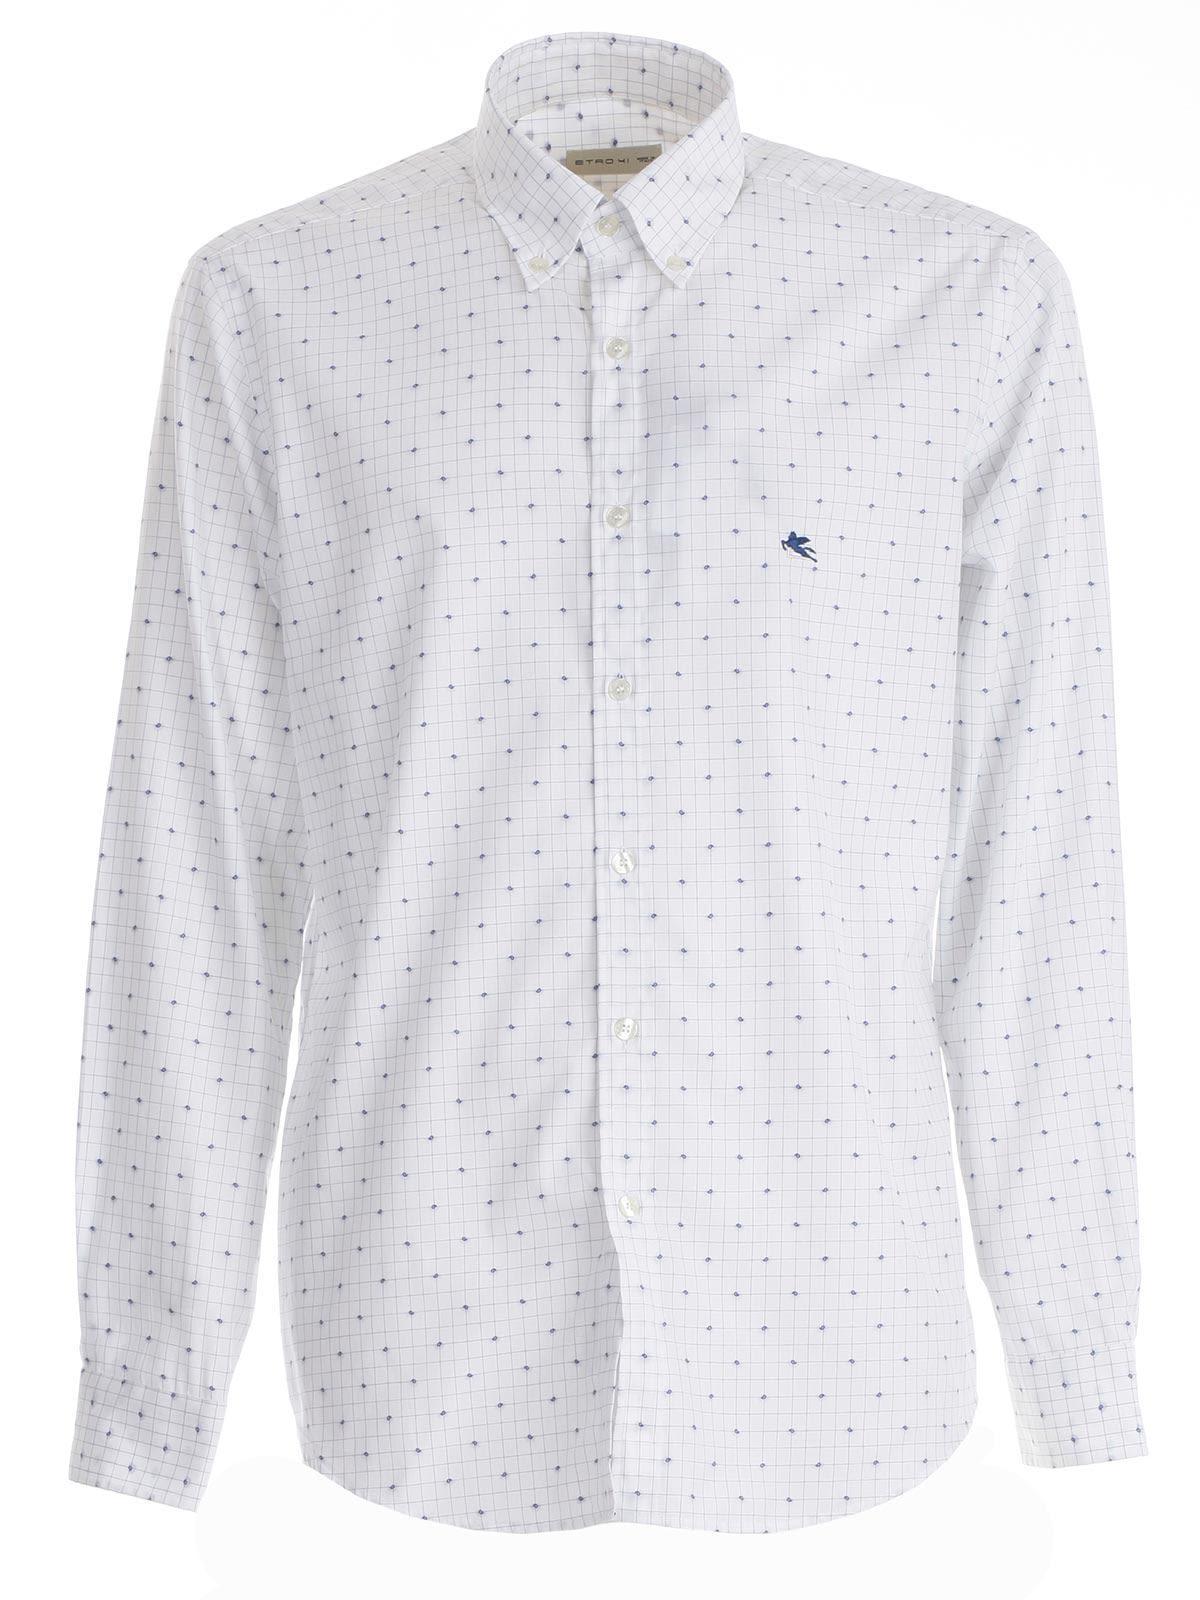 Etro Printed Shirt In White Navy